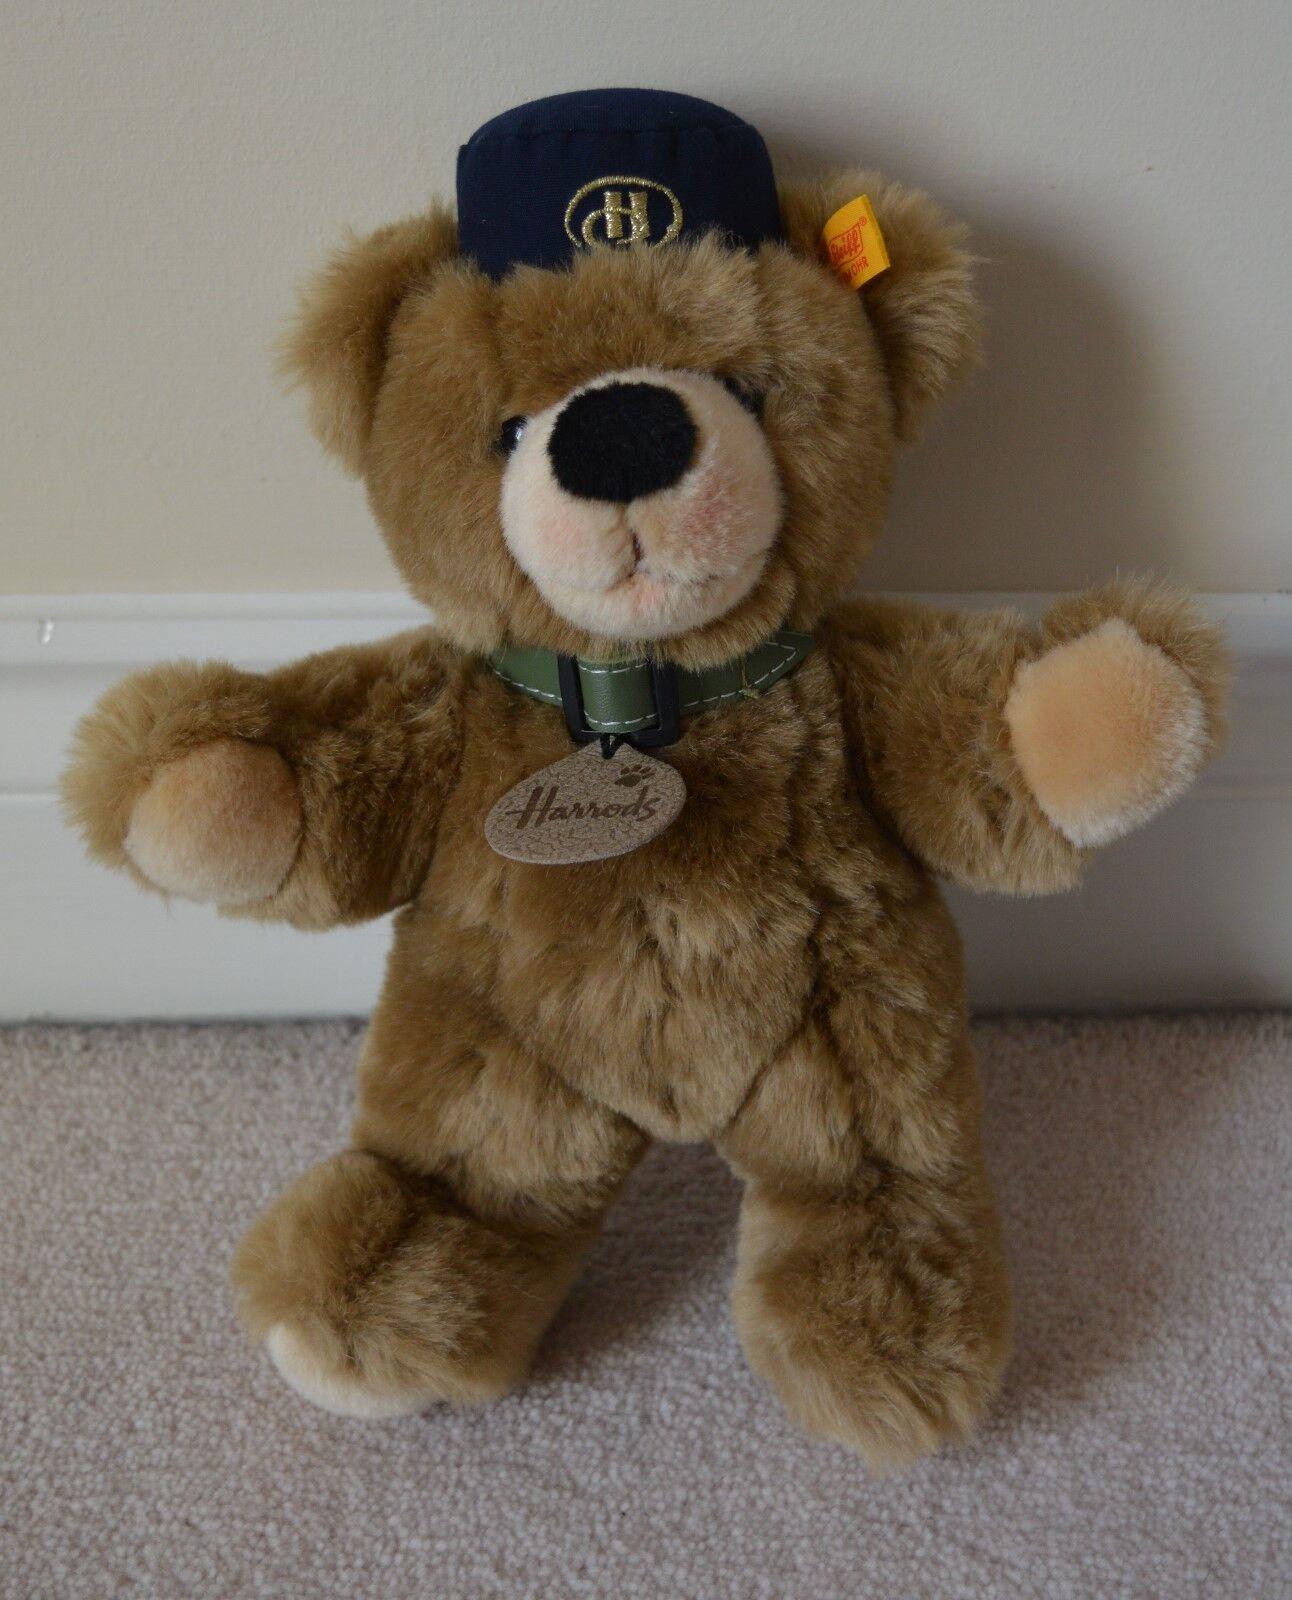 Steiff Harrods Teddy Bear 26 Cm